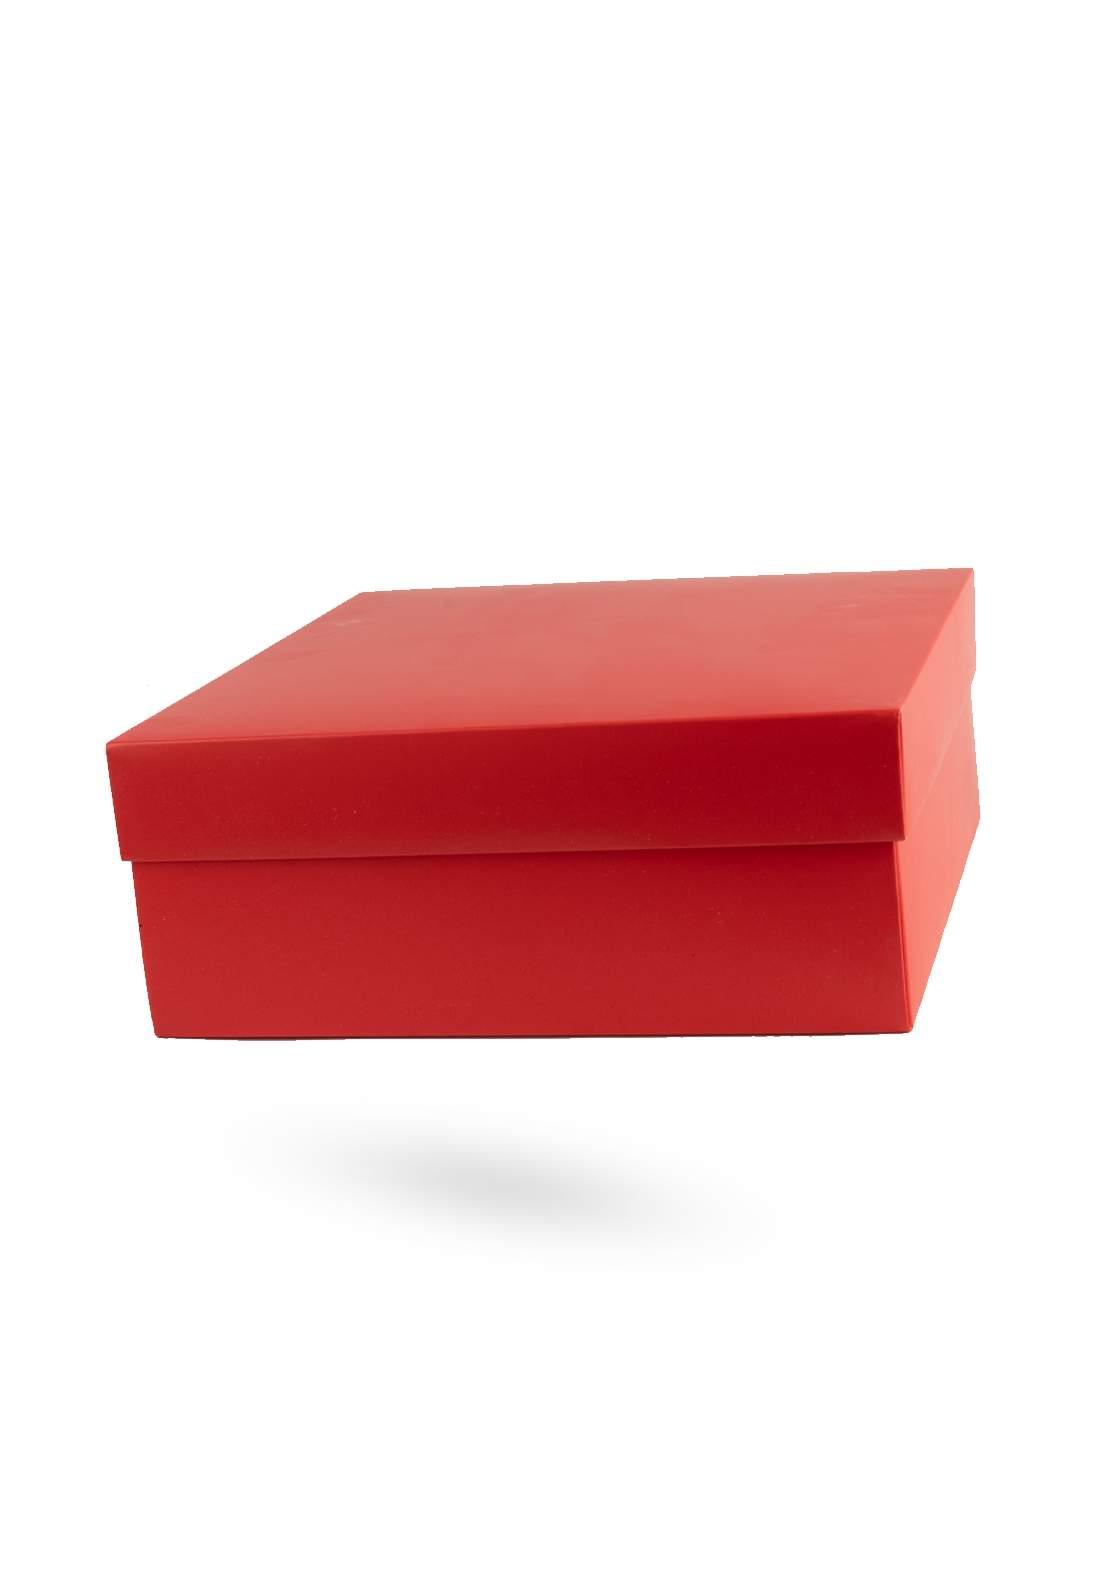 صندوق هدايا احمر اللون